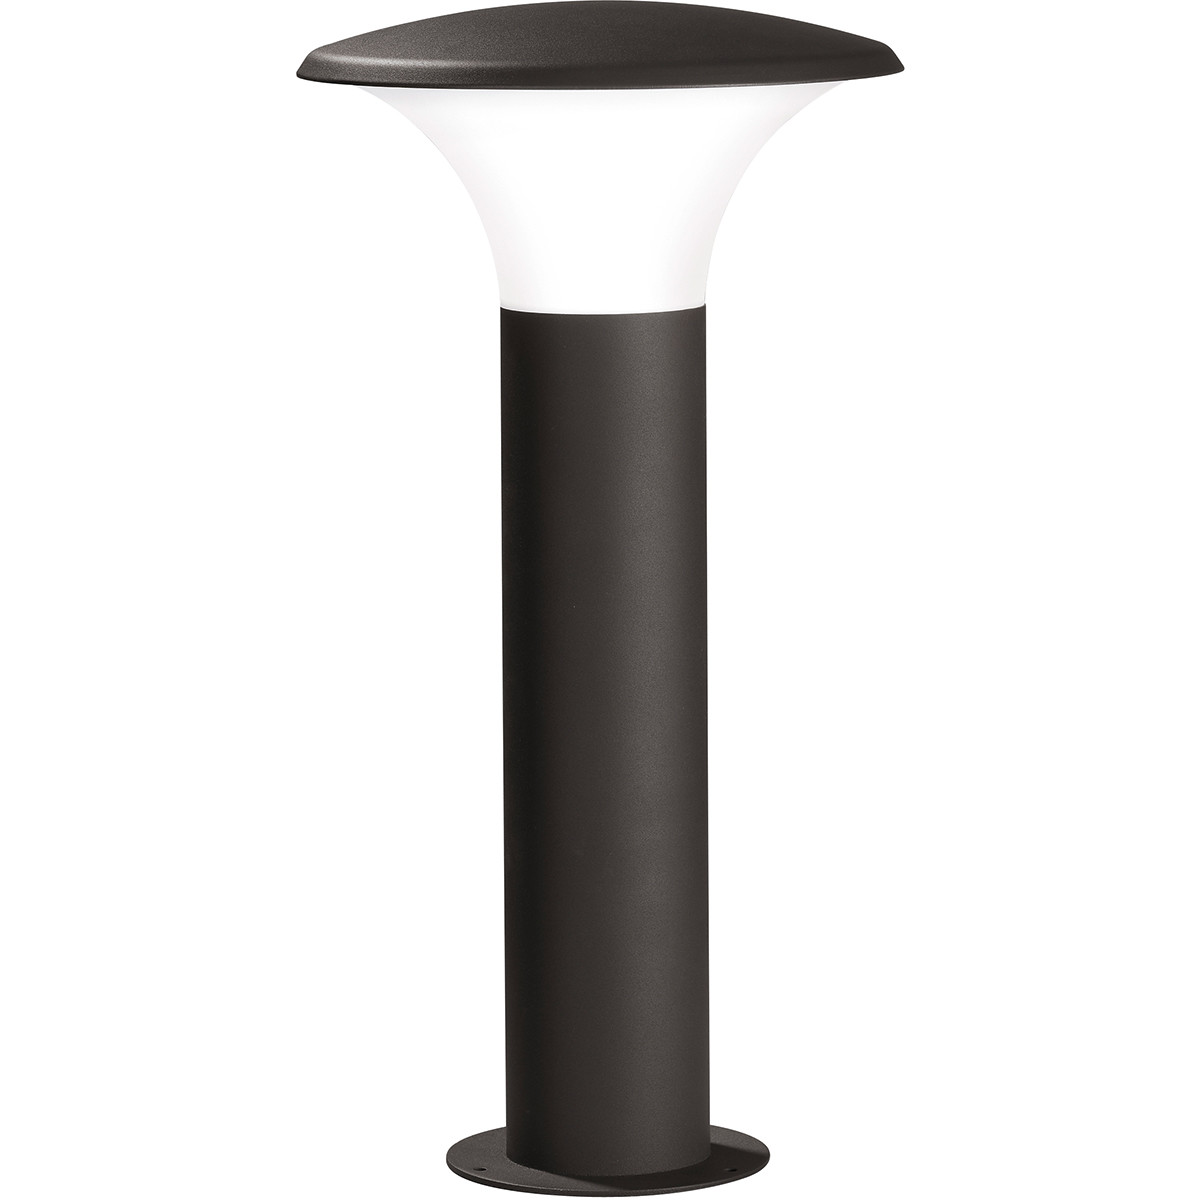 LED Tuinverlichting - Buitenlamp - Trion Karminy - Staand - 5W - E27 Fitting - Mat Zwart - Aluminium